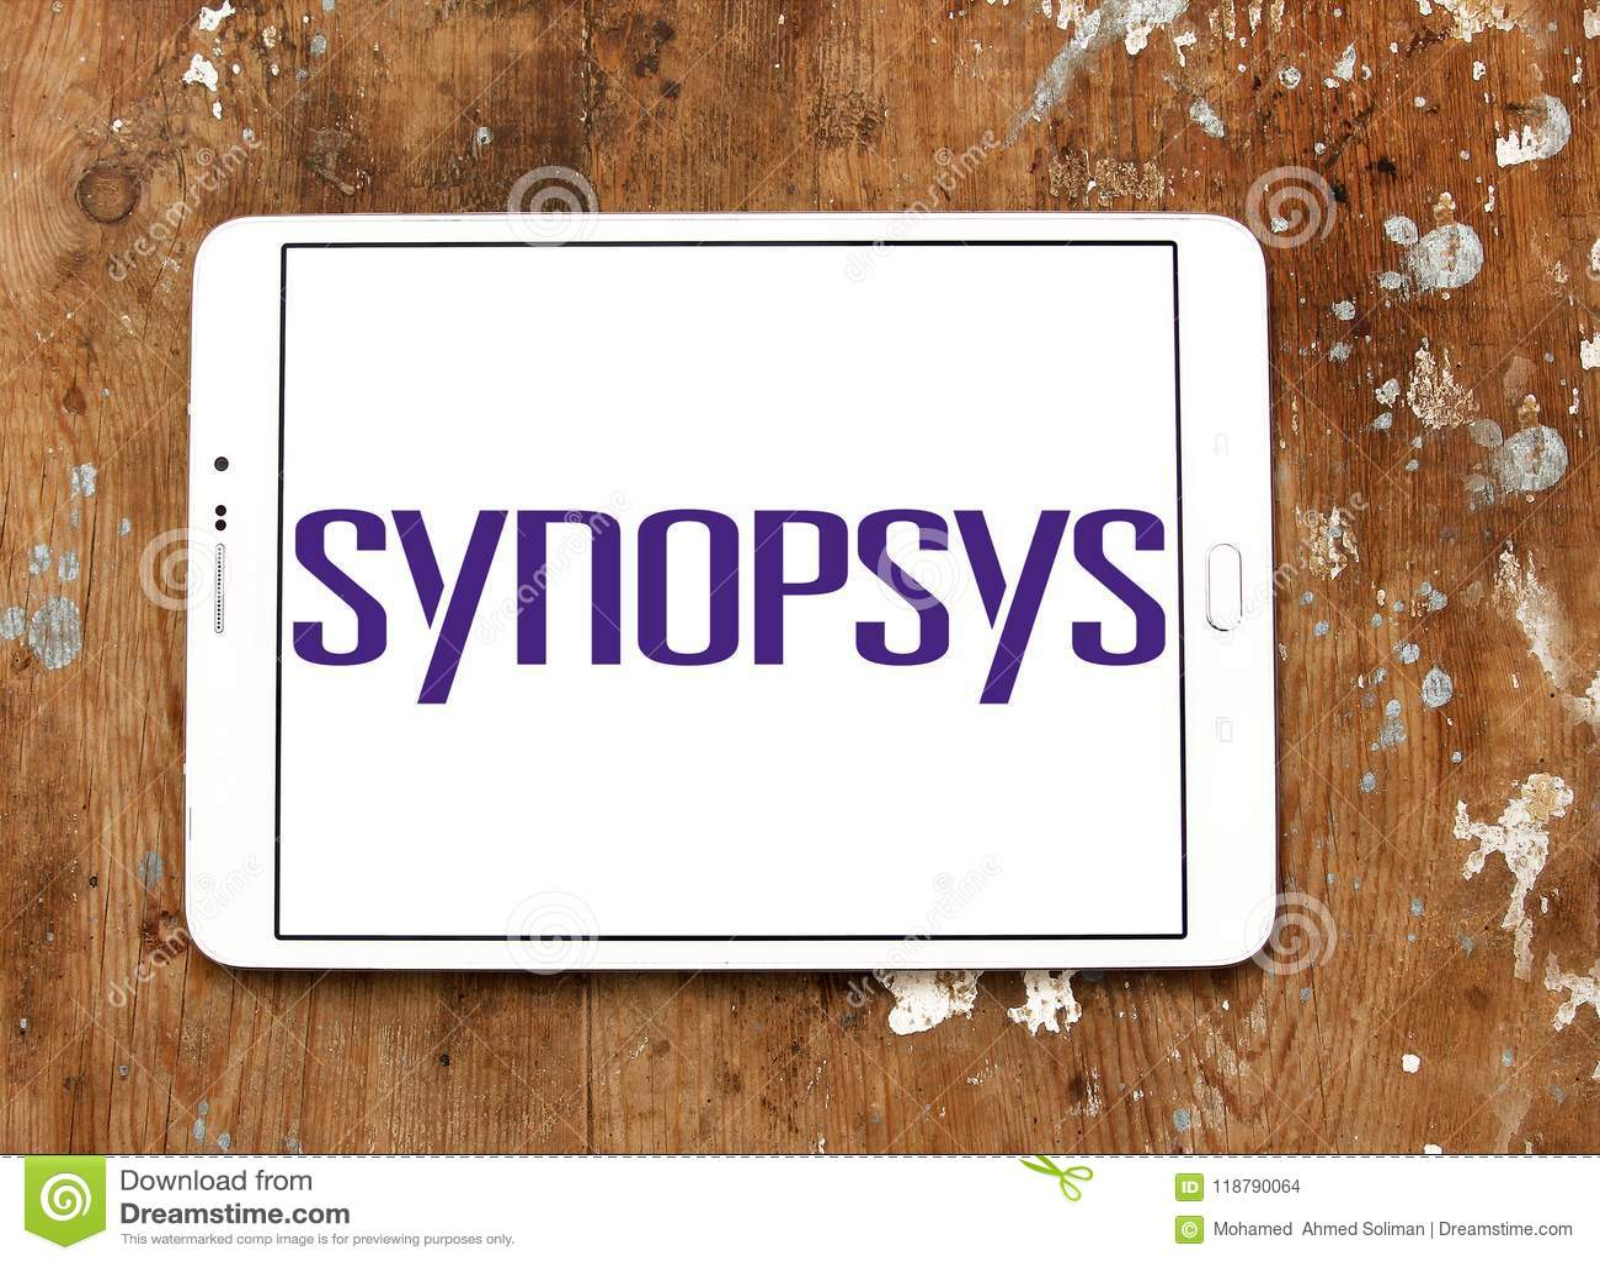 Synopsys Software Company Logo Editorial Stock Image - Image